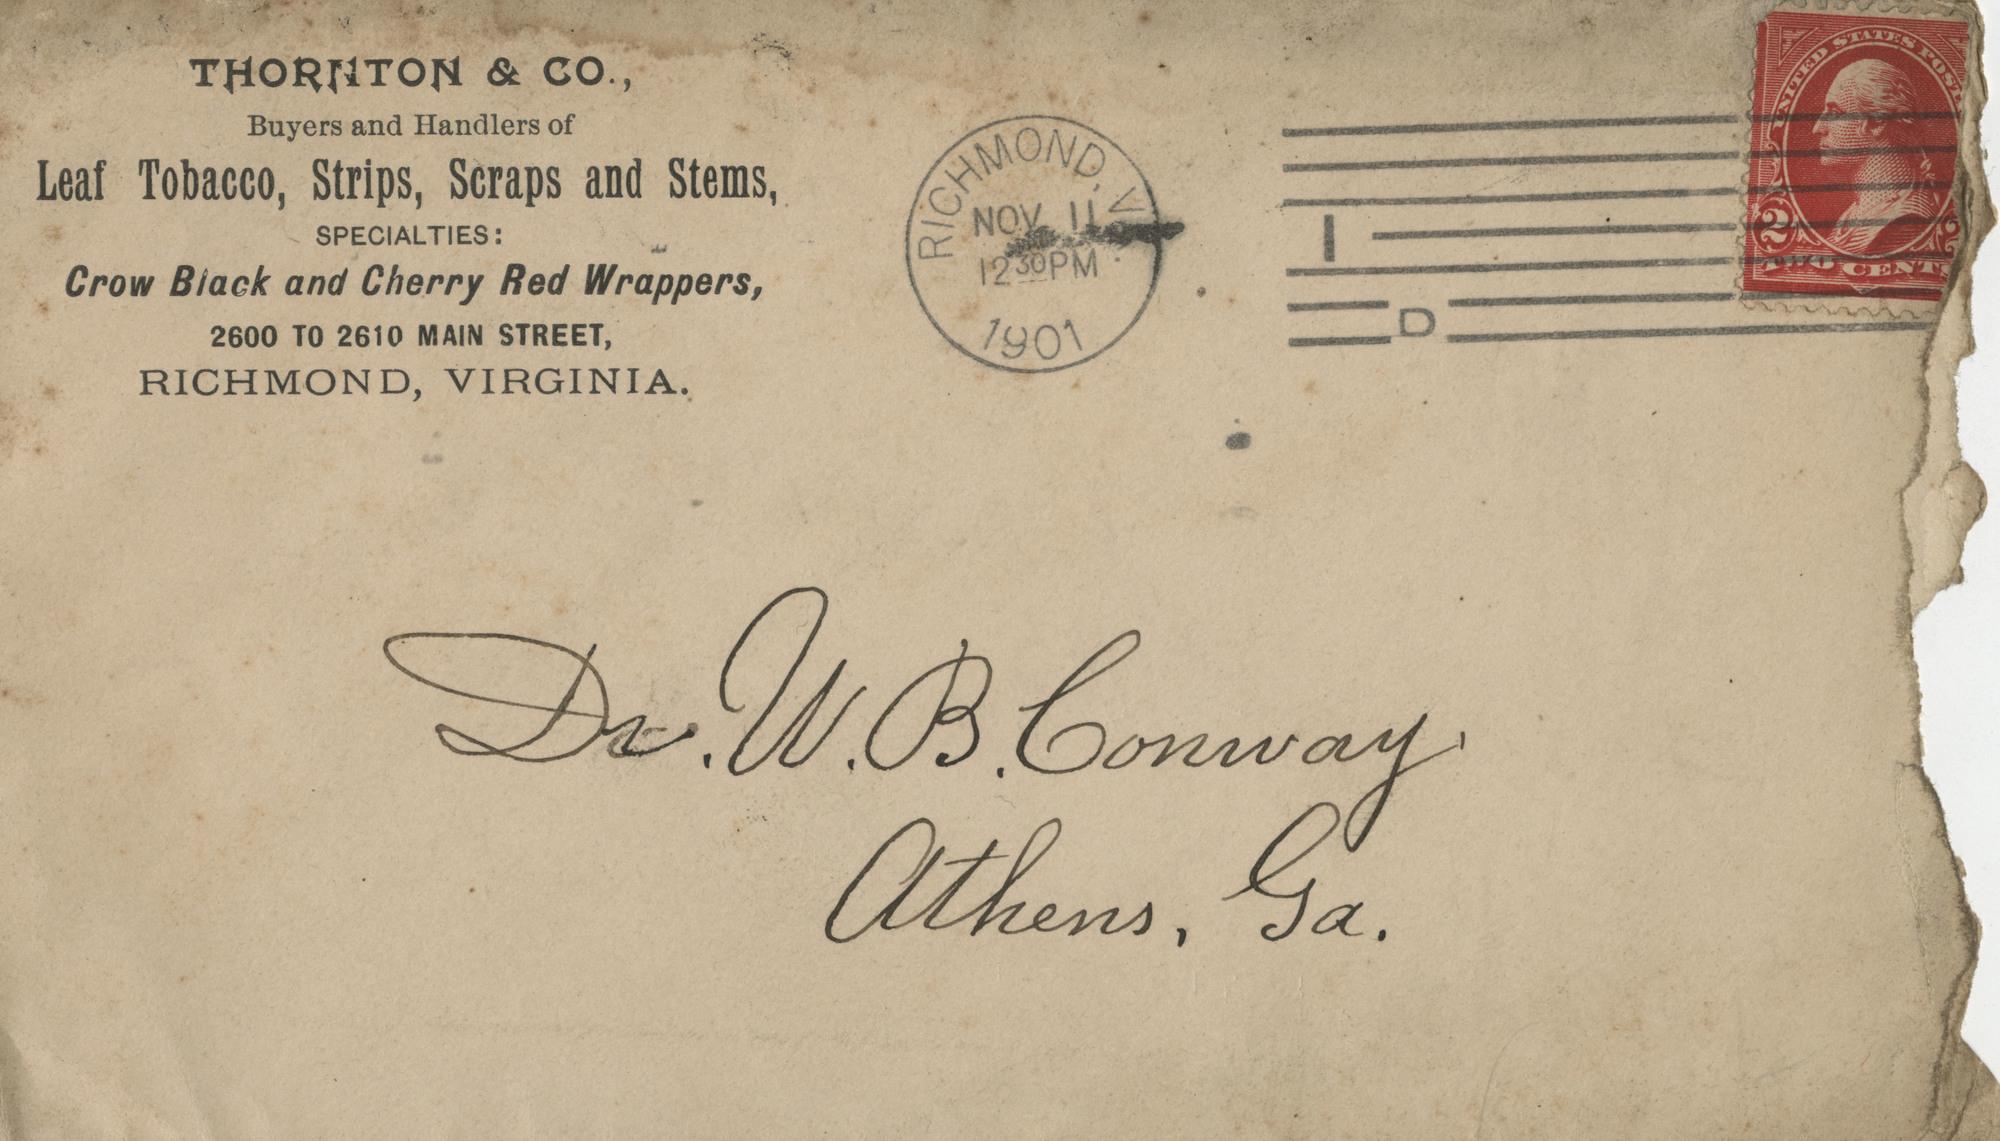 http://spec.lib.vt.edu/pickup/Omeka_upload/Ms2012-039_ConwayCatlett_F3_Letter_1901_1111_enva.jpg